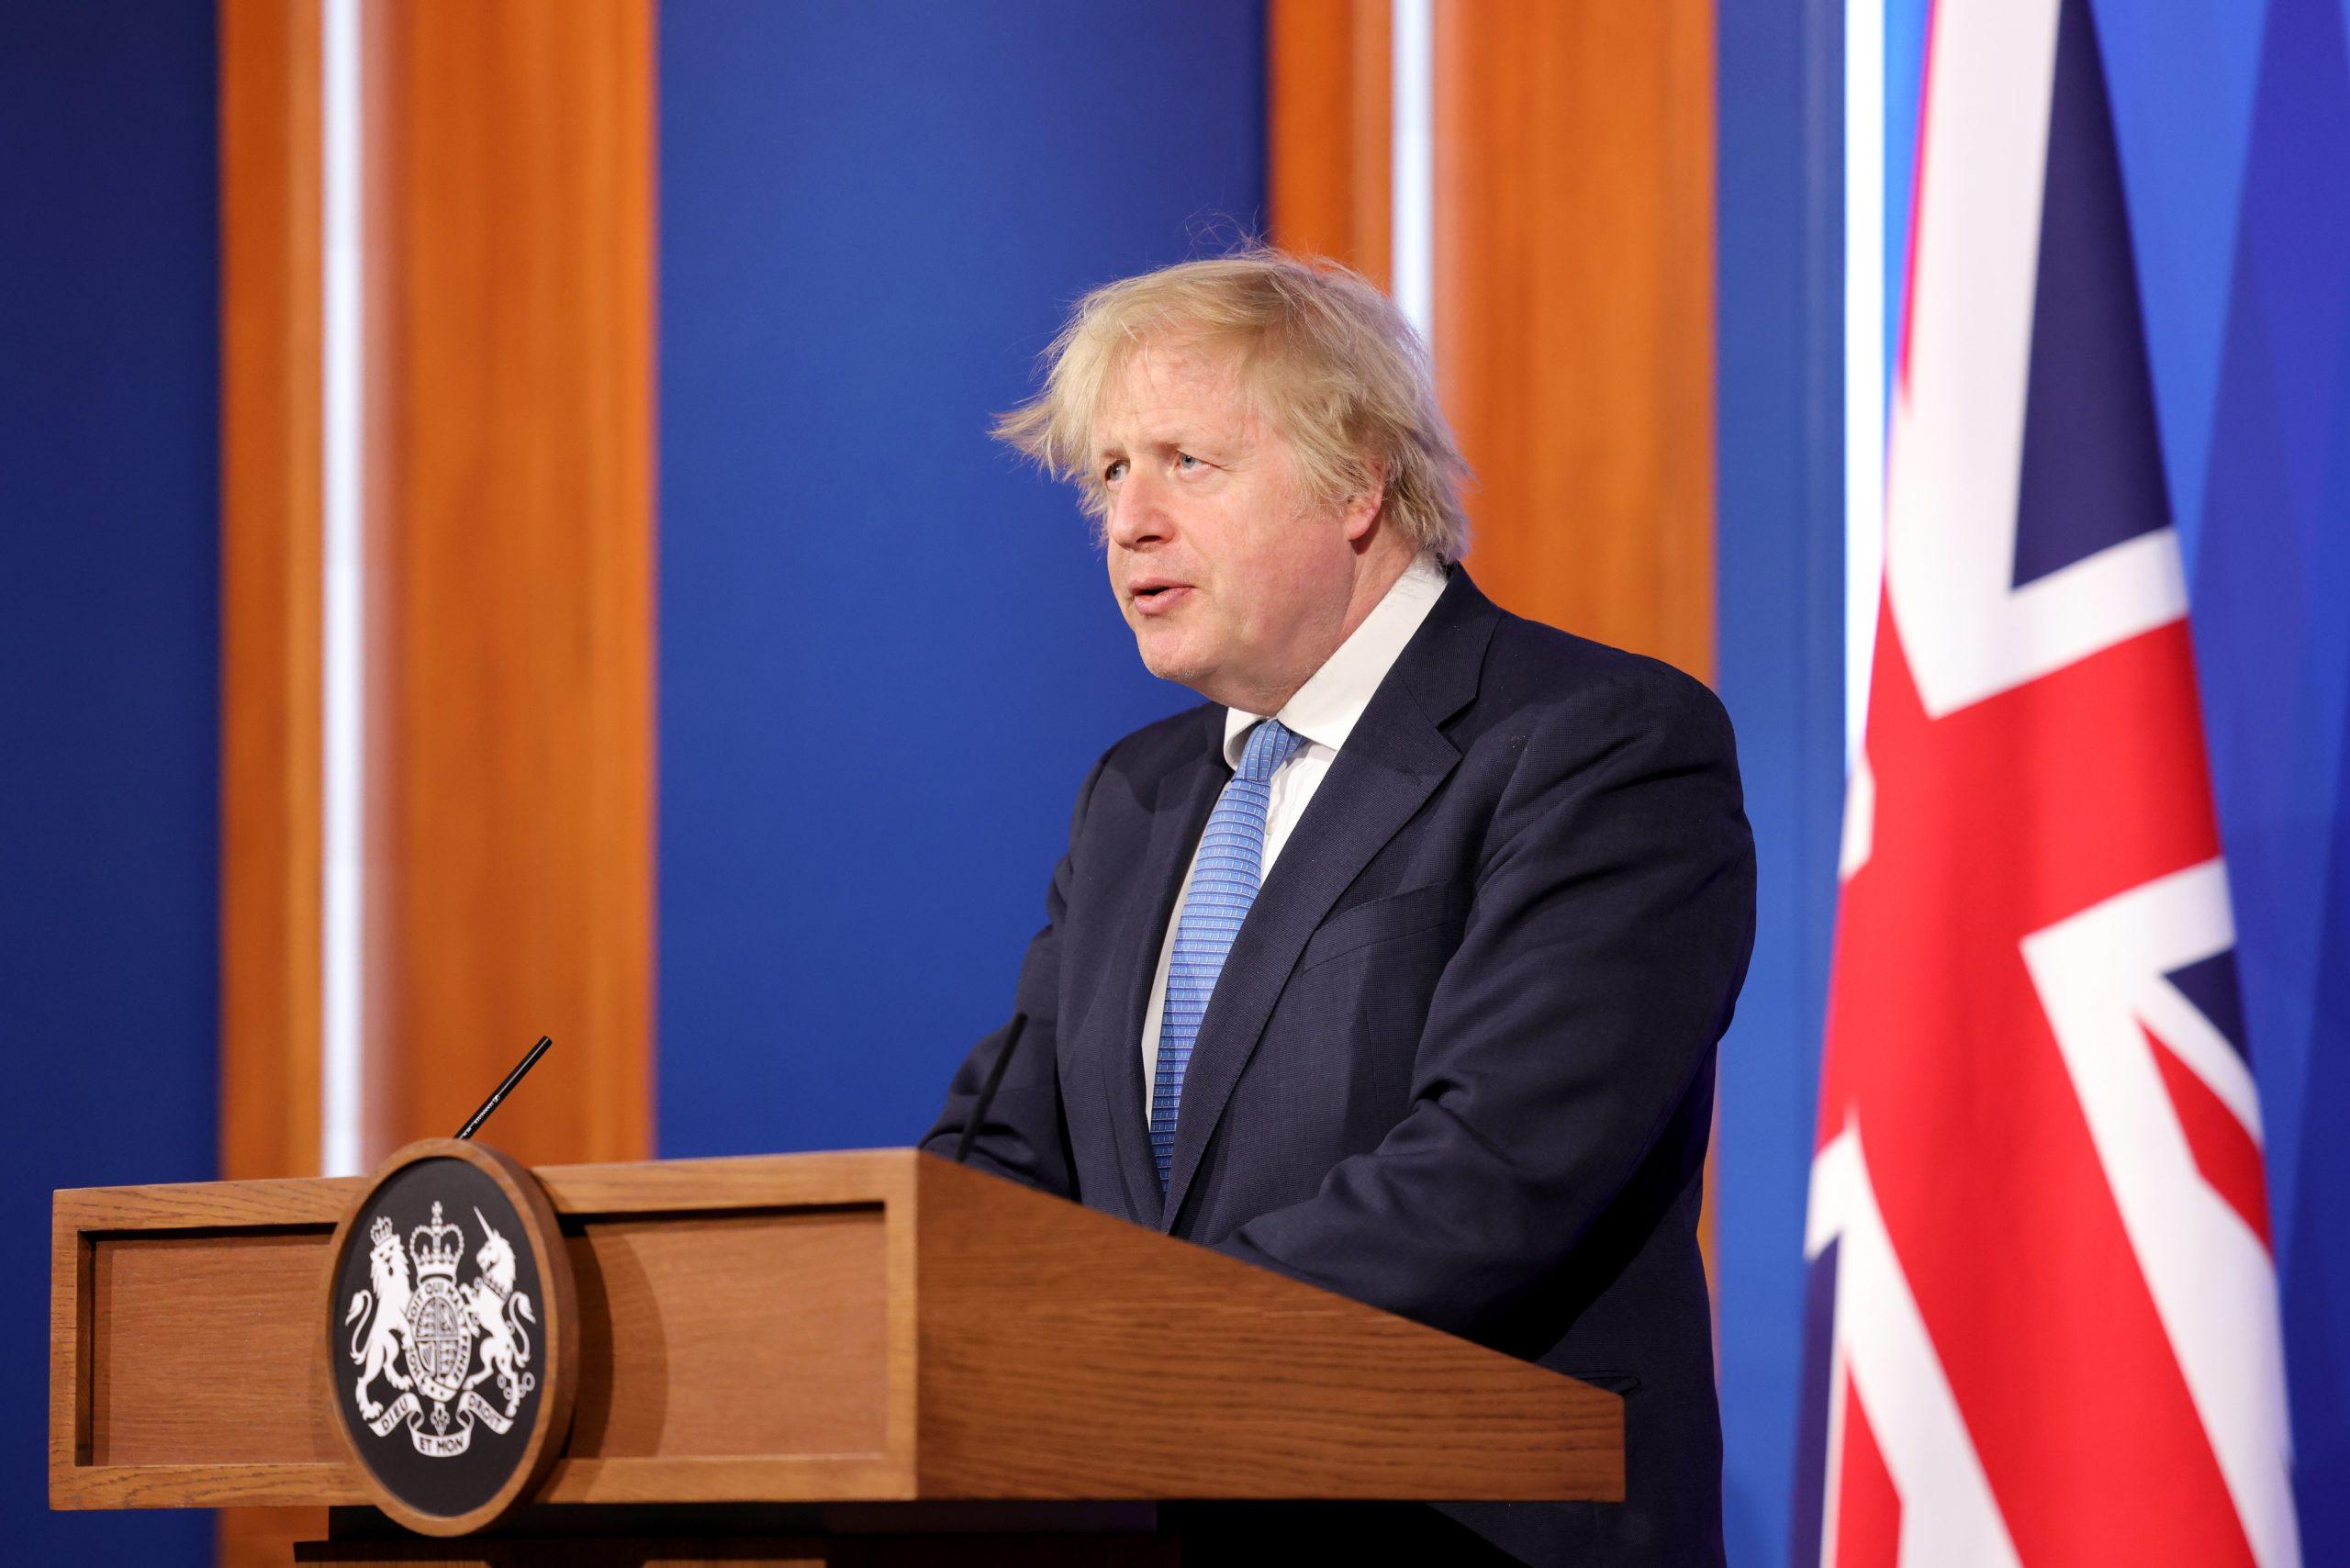 Boris Johnson [Photo Credit: @BorisJohnson]